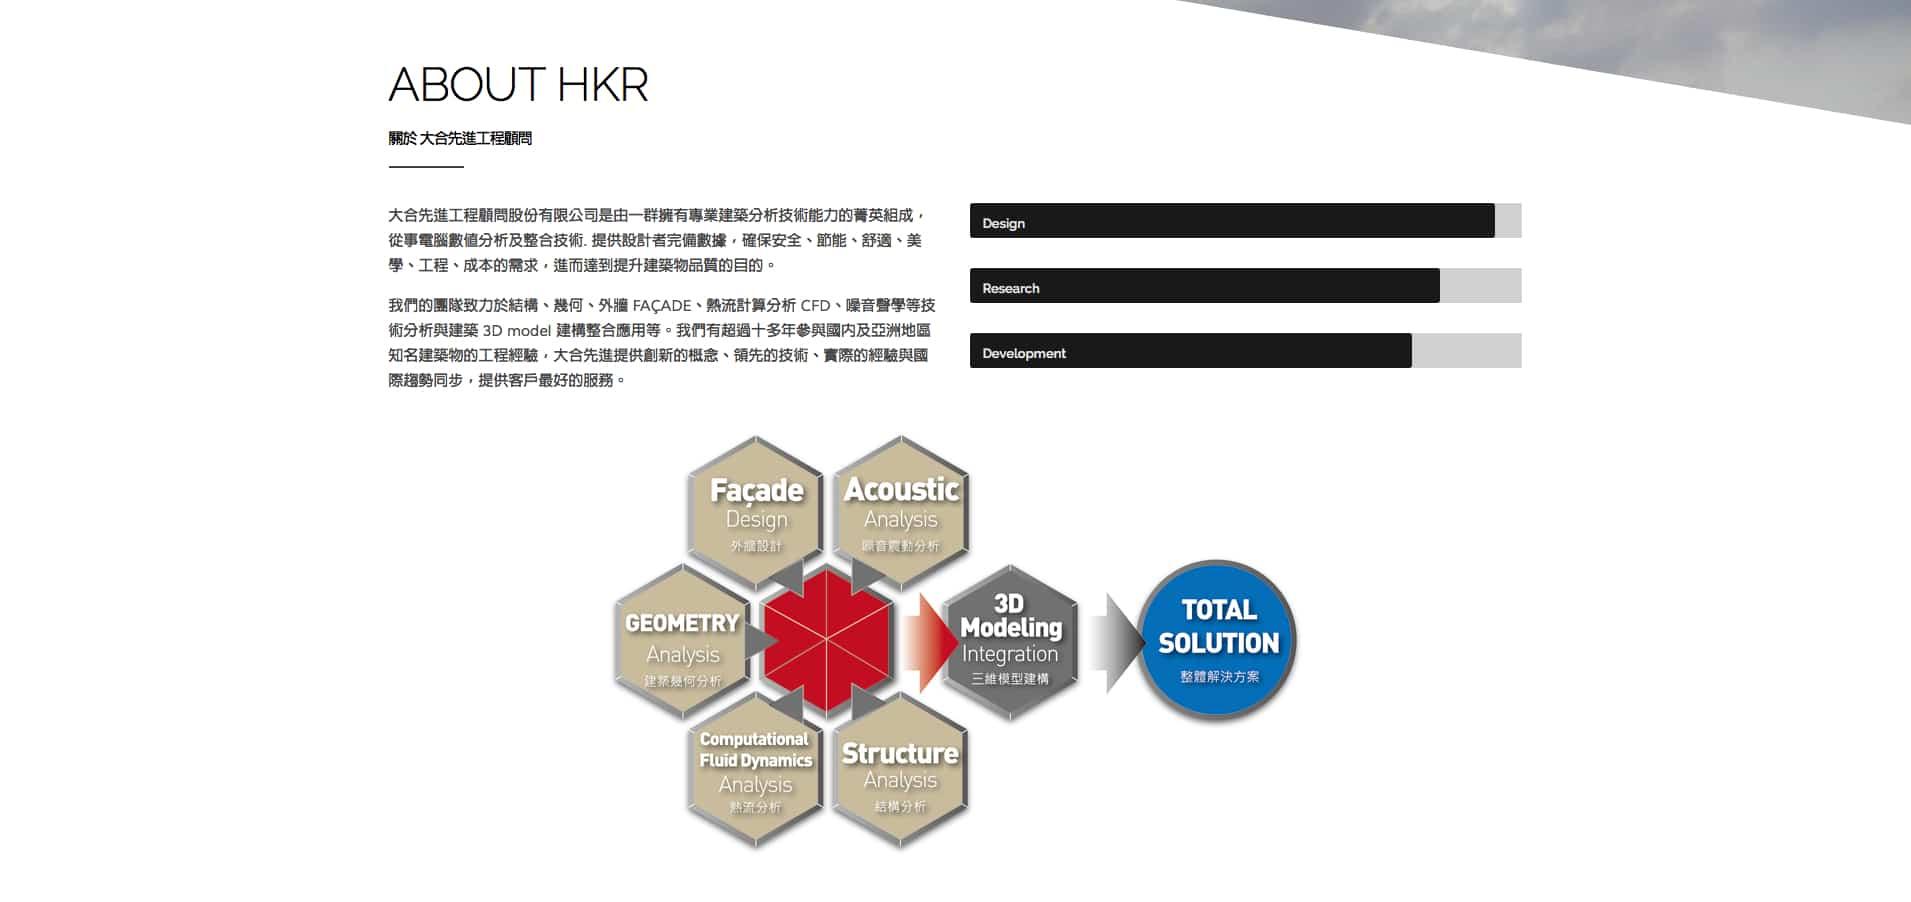 HKR-web-05